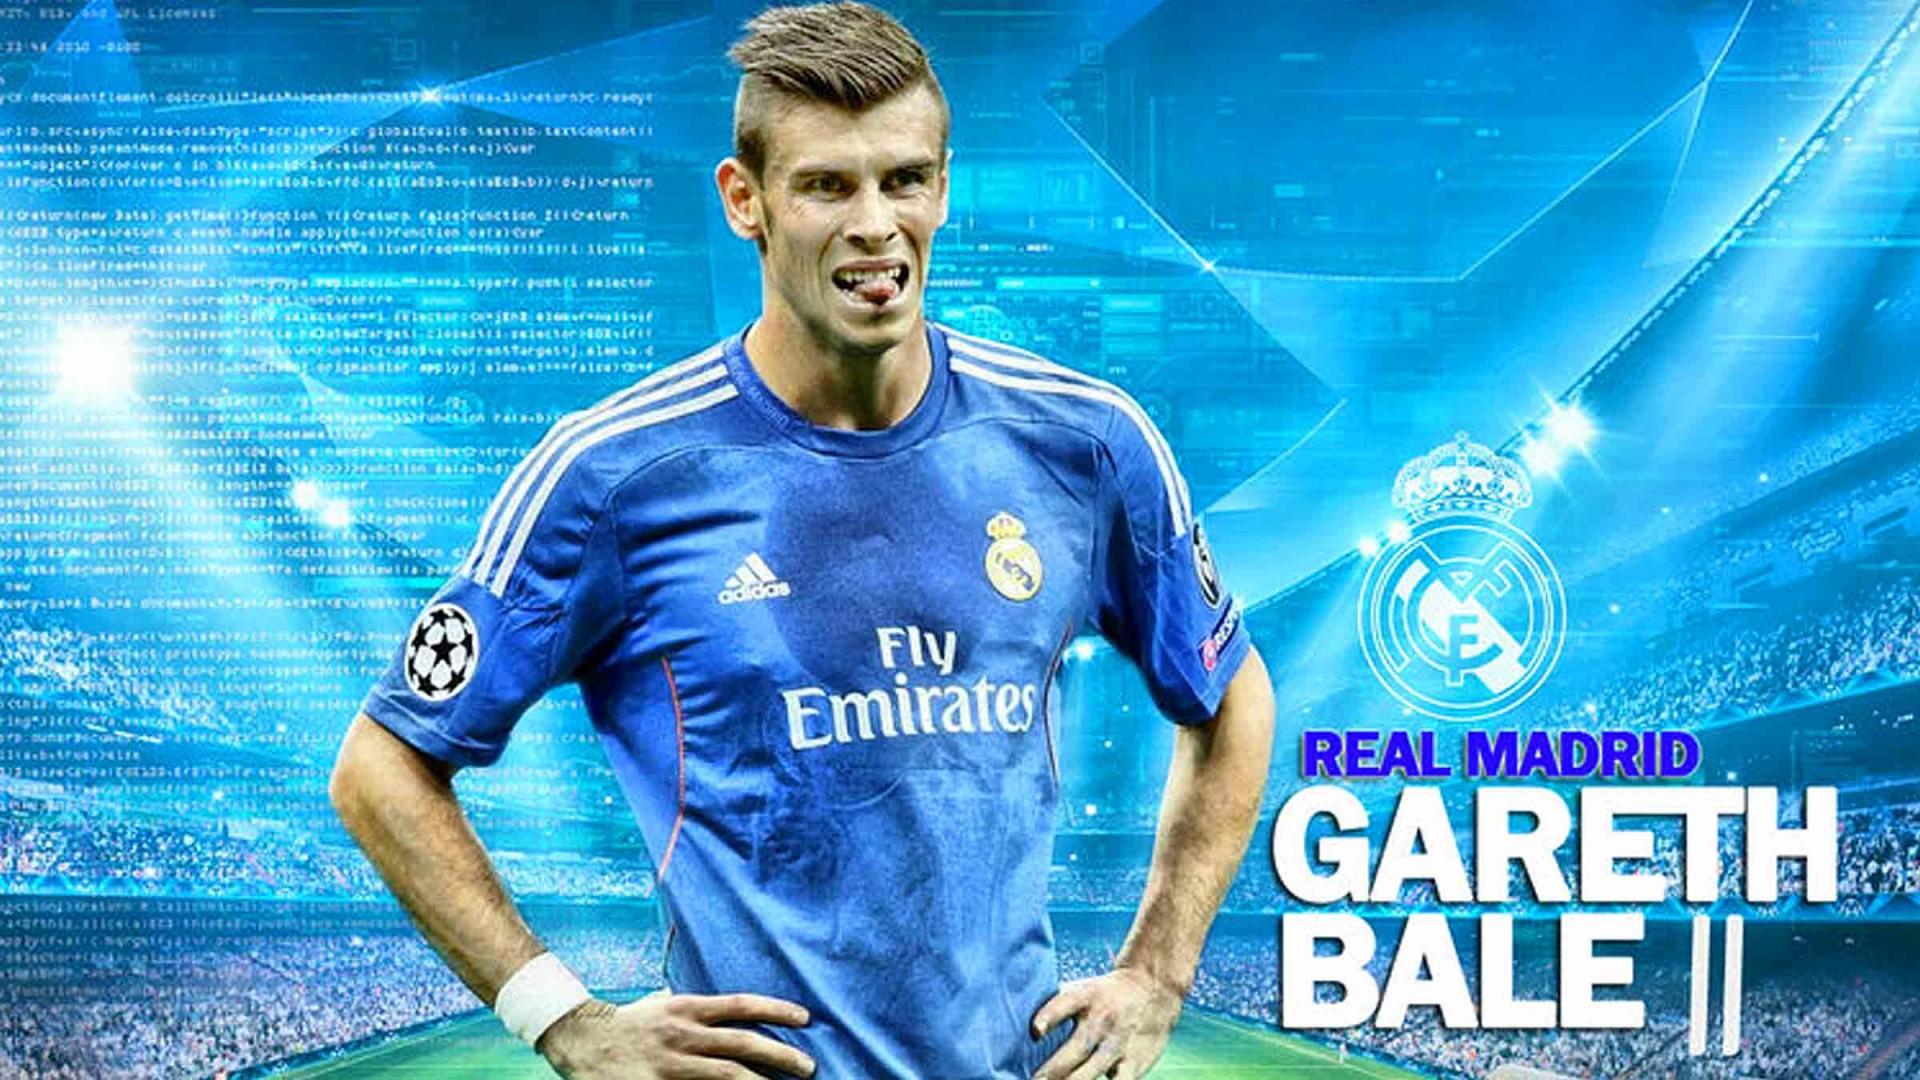 Gareth Bale 2014 Wallpaper Hd 2